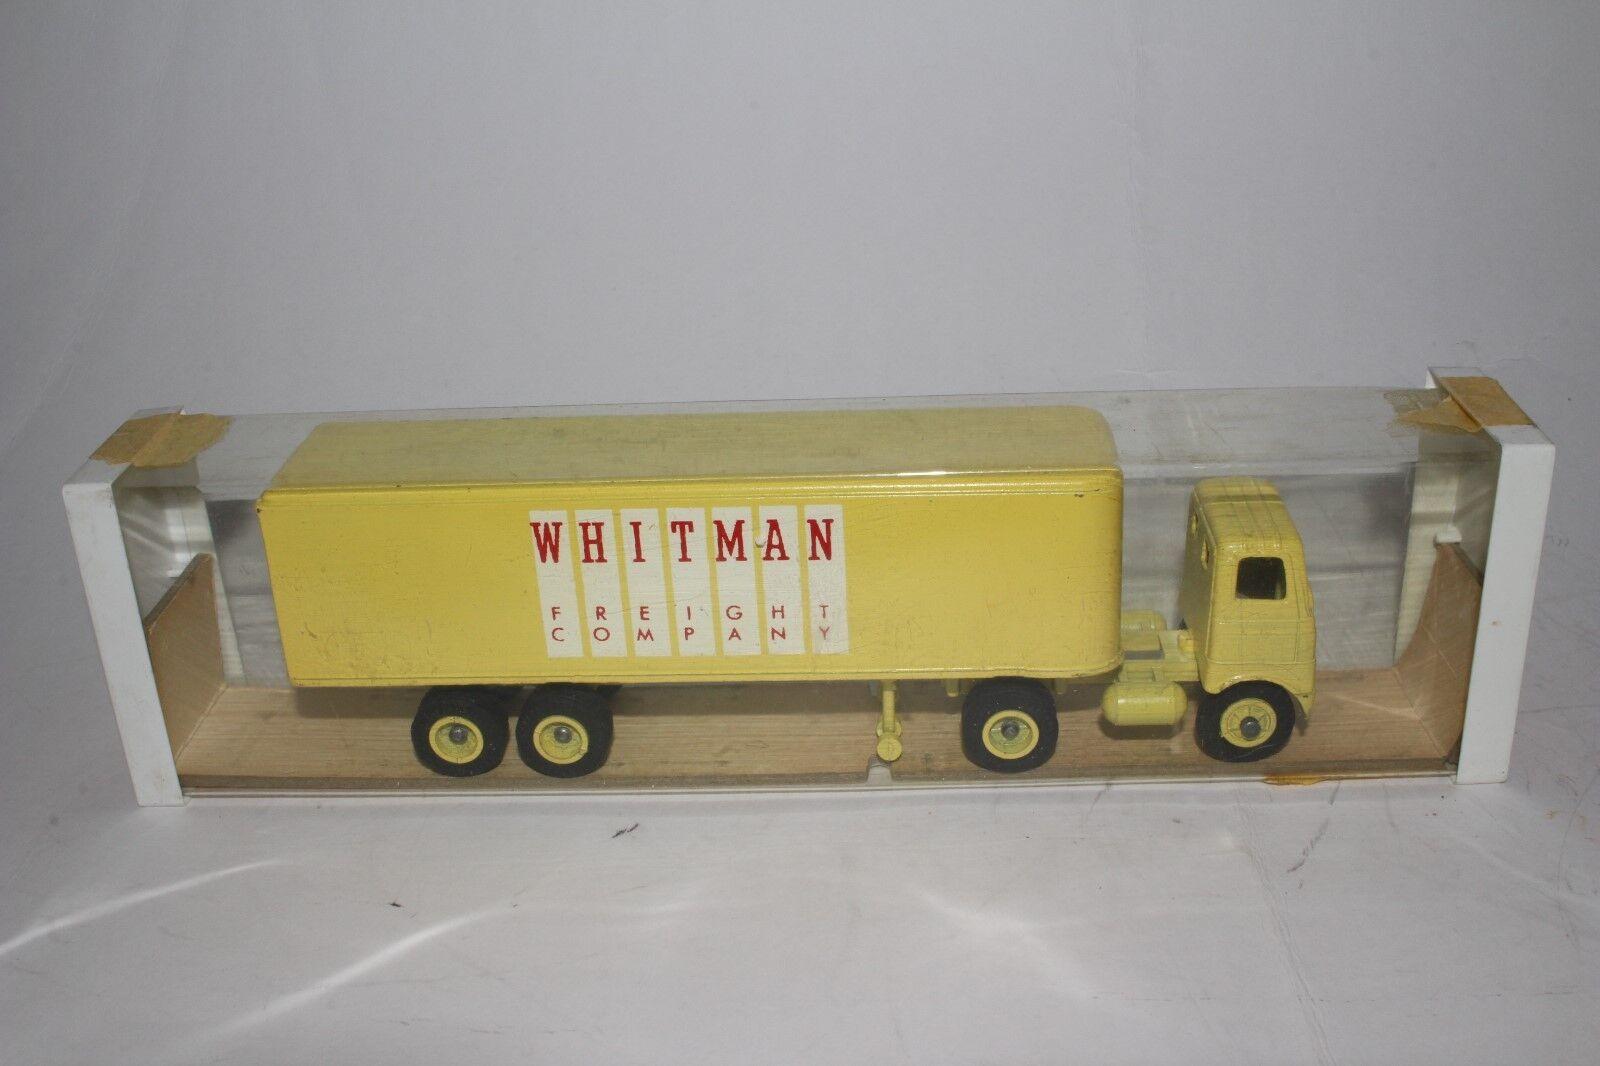 597ms Camion Winross Whitman Merci Co Semi Camion con Scatola, Nice Originale